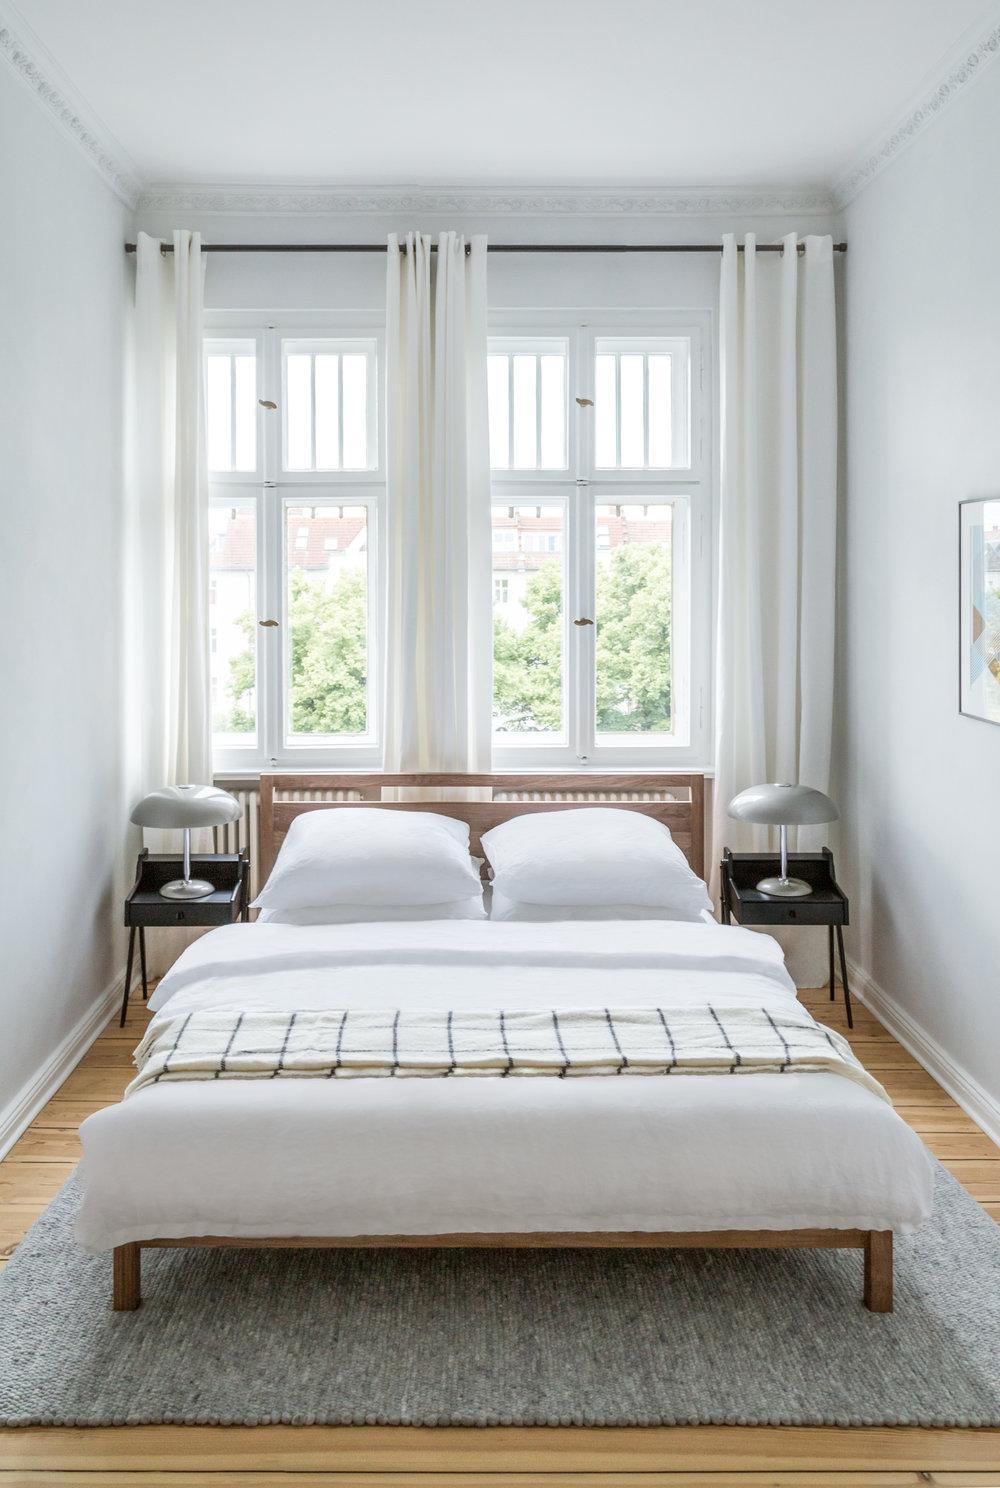 09-White_Arrow-Paul-Lincke-Ufer-Apartment.jpg